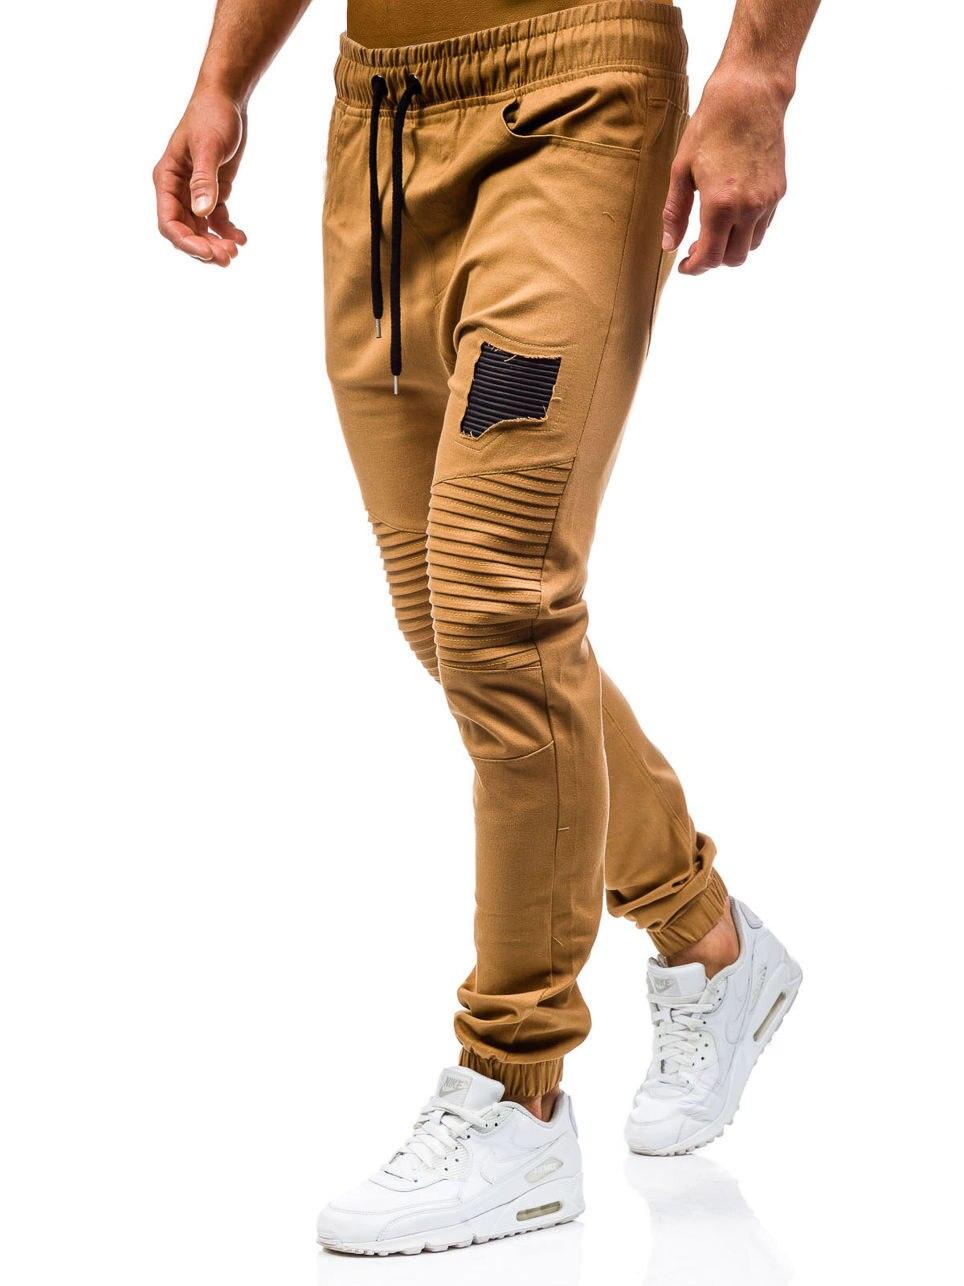 Men Sweatpants Casual Pants Slim fit Drawstring Sweatpants Slacks Elastic Waist Patchwork Pleated Ultrathin Male Trousers Jogger 10